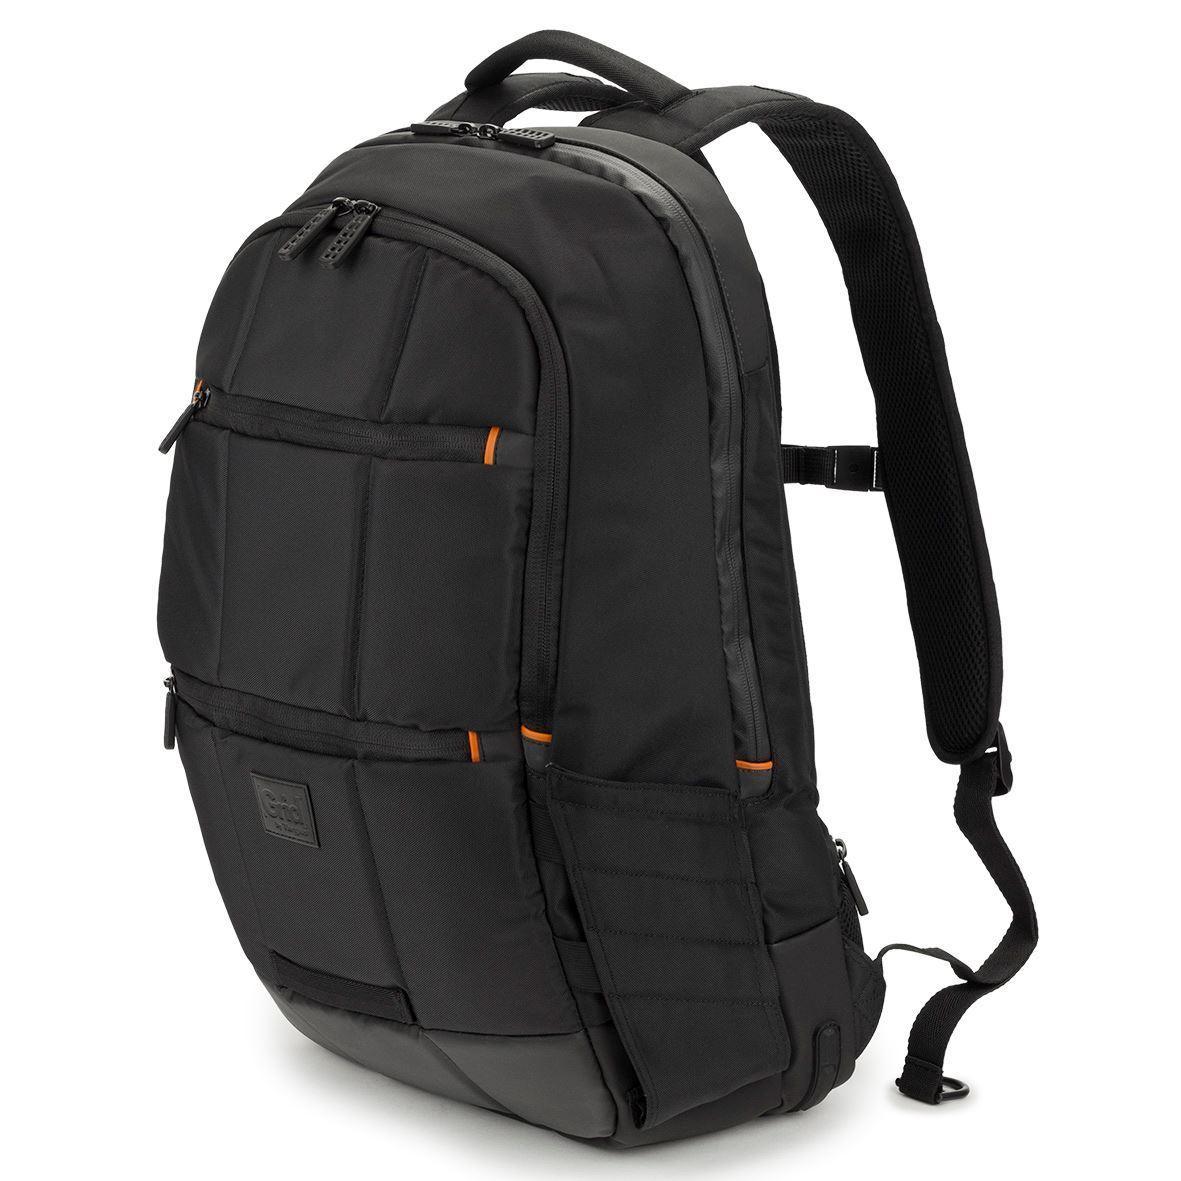 "Grid 16"" Advanced Laptop Backpack"